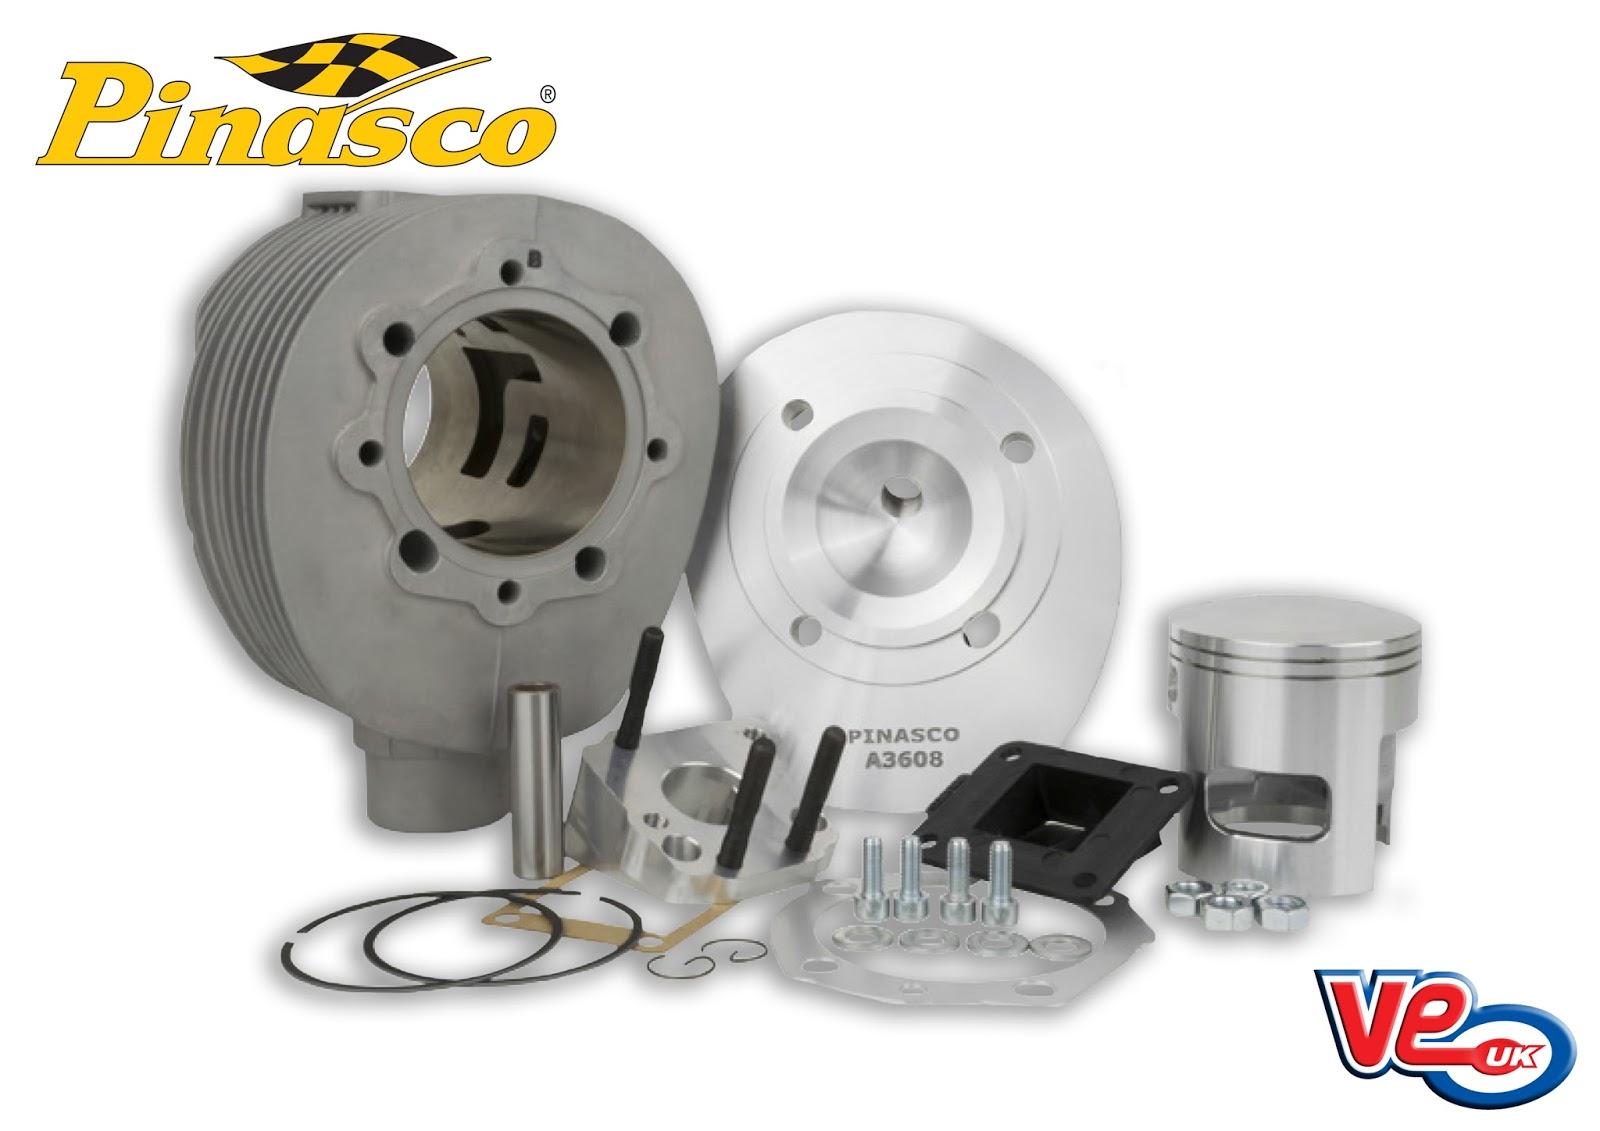 Pinasco Vespa GS160-SS180 225cc Cylinder Kit